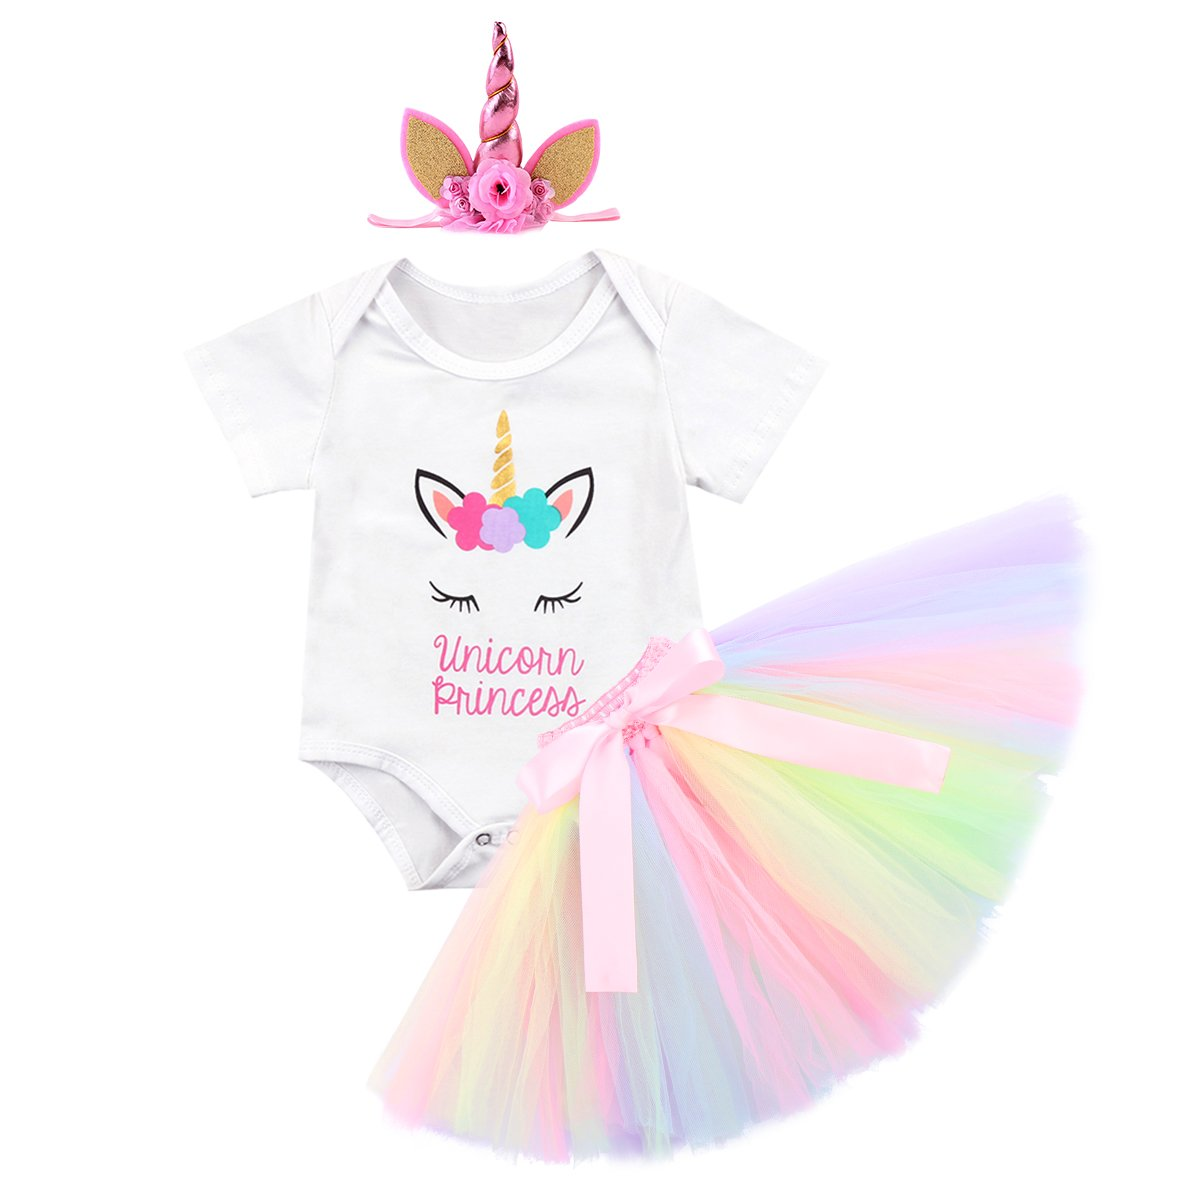 IWEMEK Baby Girls 1st 2nd Birthday Cake Smash Photo Shoot 3pcs Outfits Newborn Infant Princess Halloween